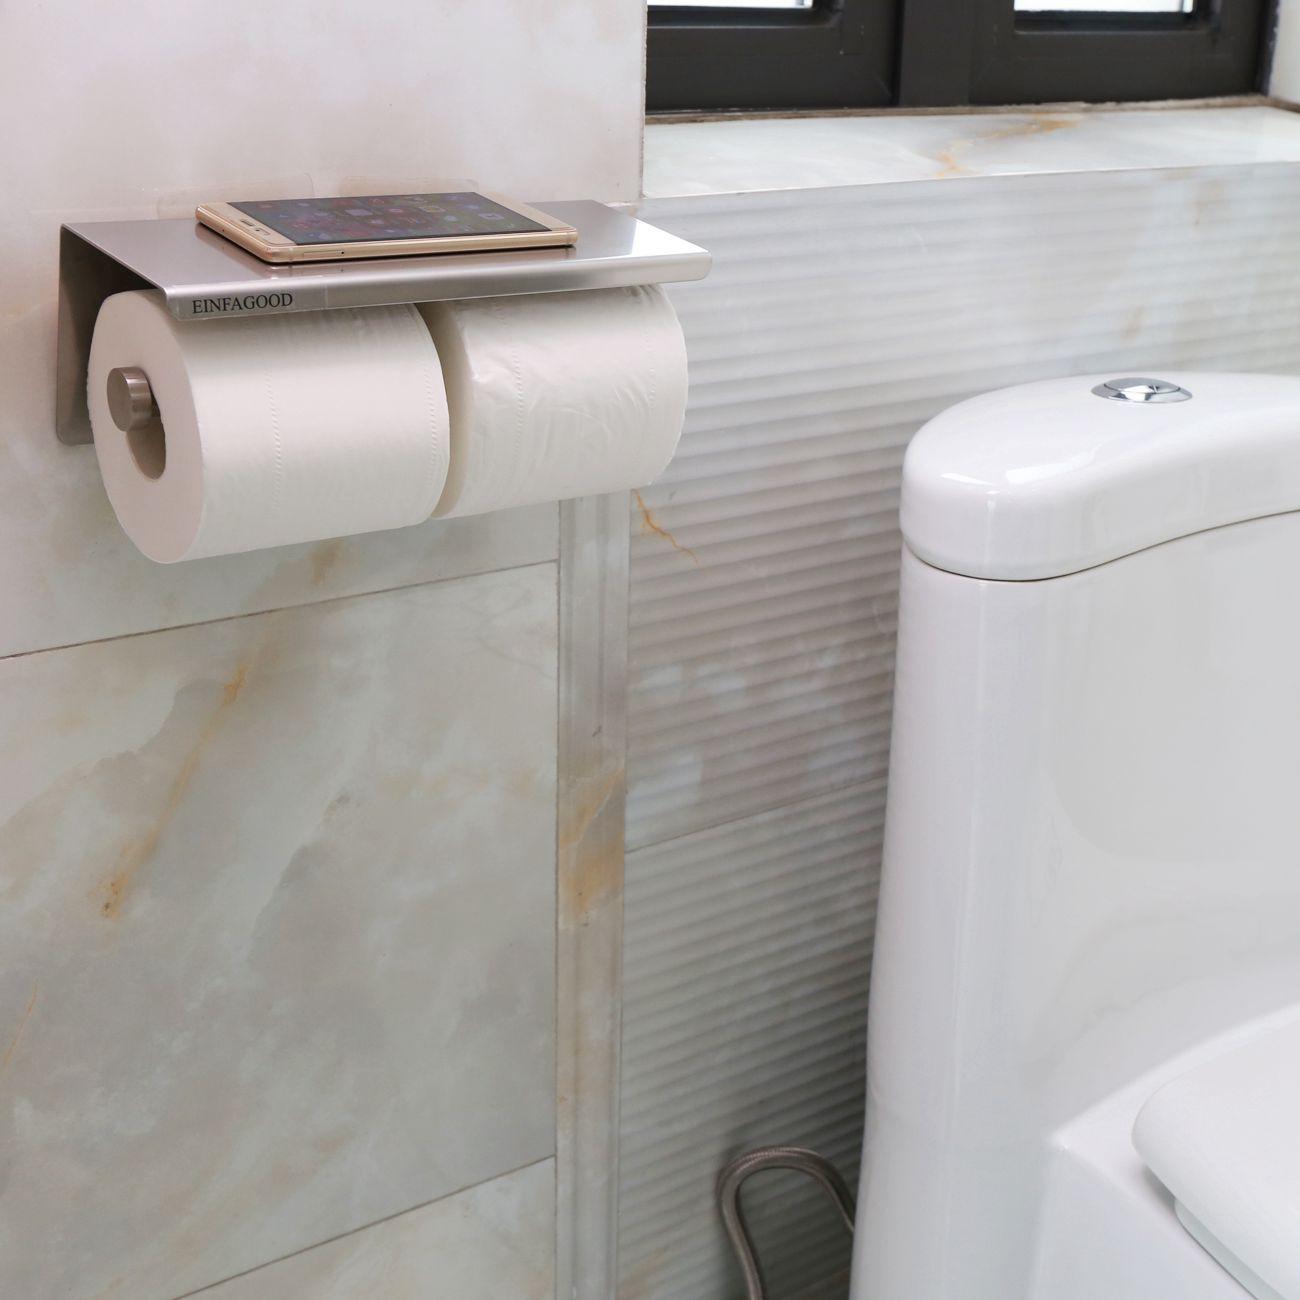 Toilet paper holder einfagood toilet roll tissue holder - Bathroom towel and toilet paper holders ...